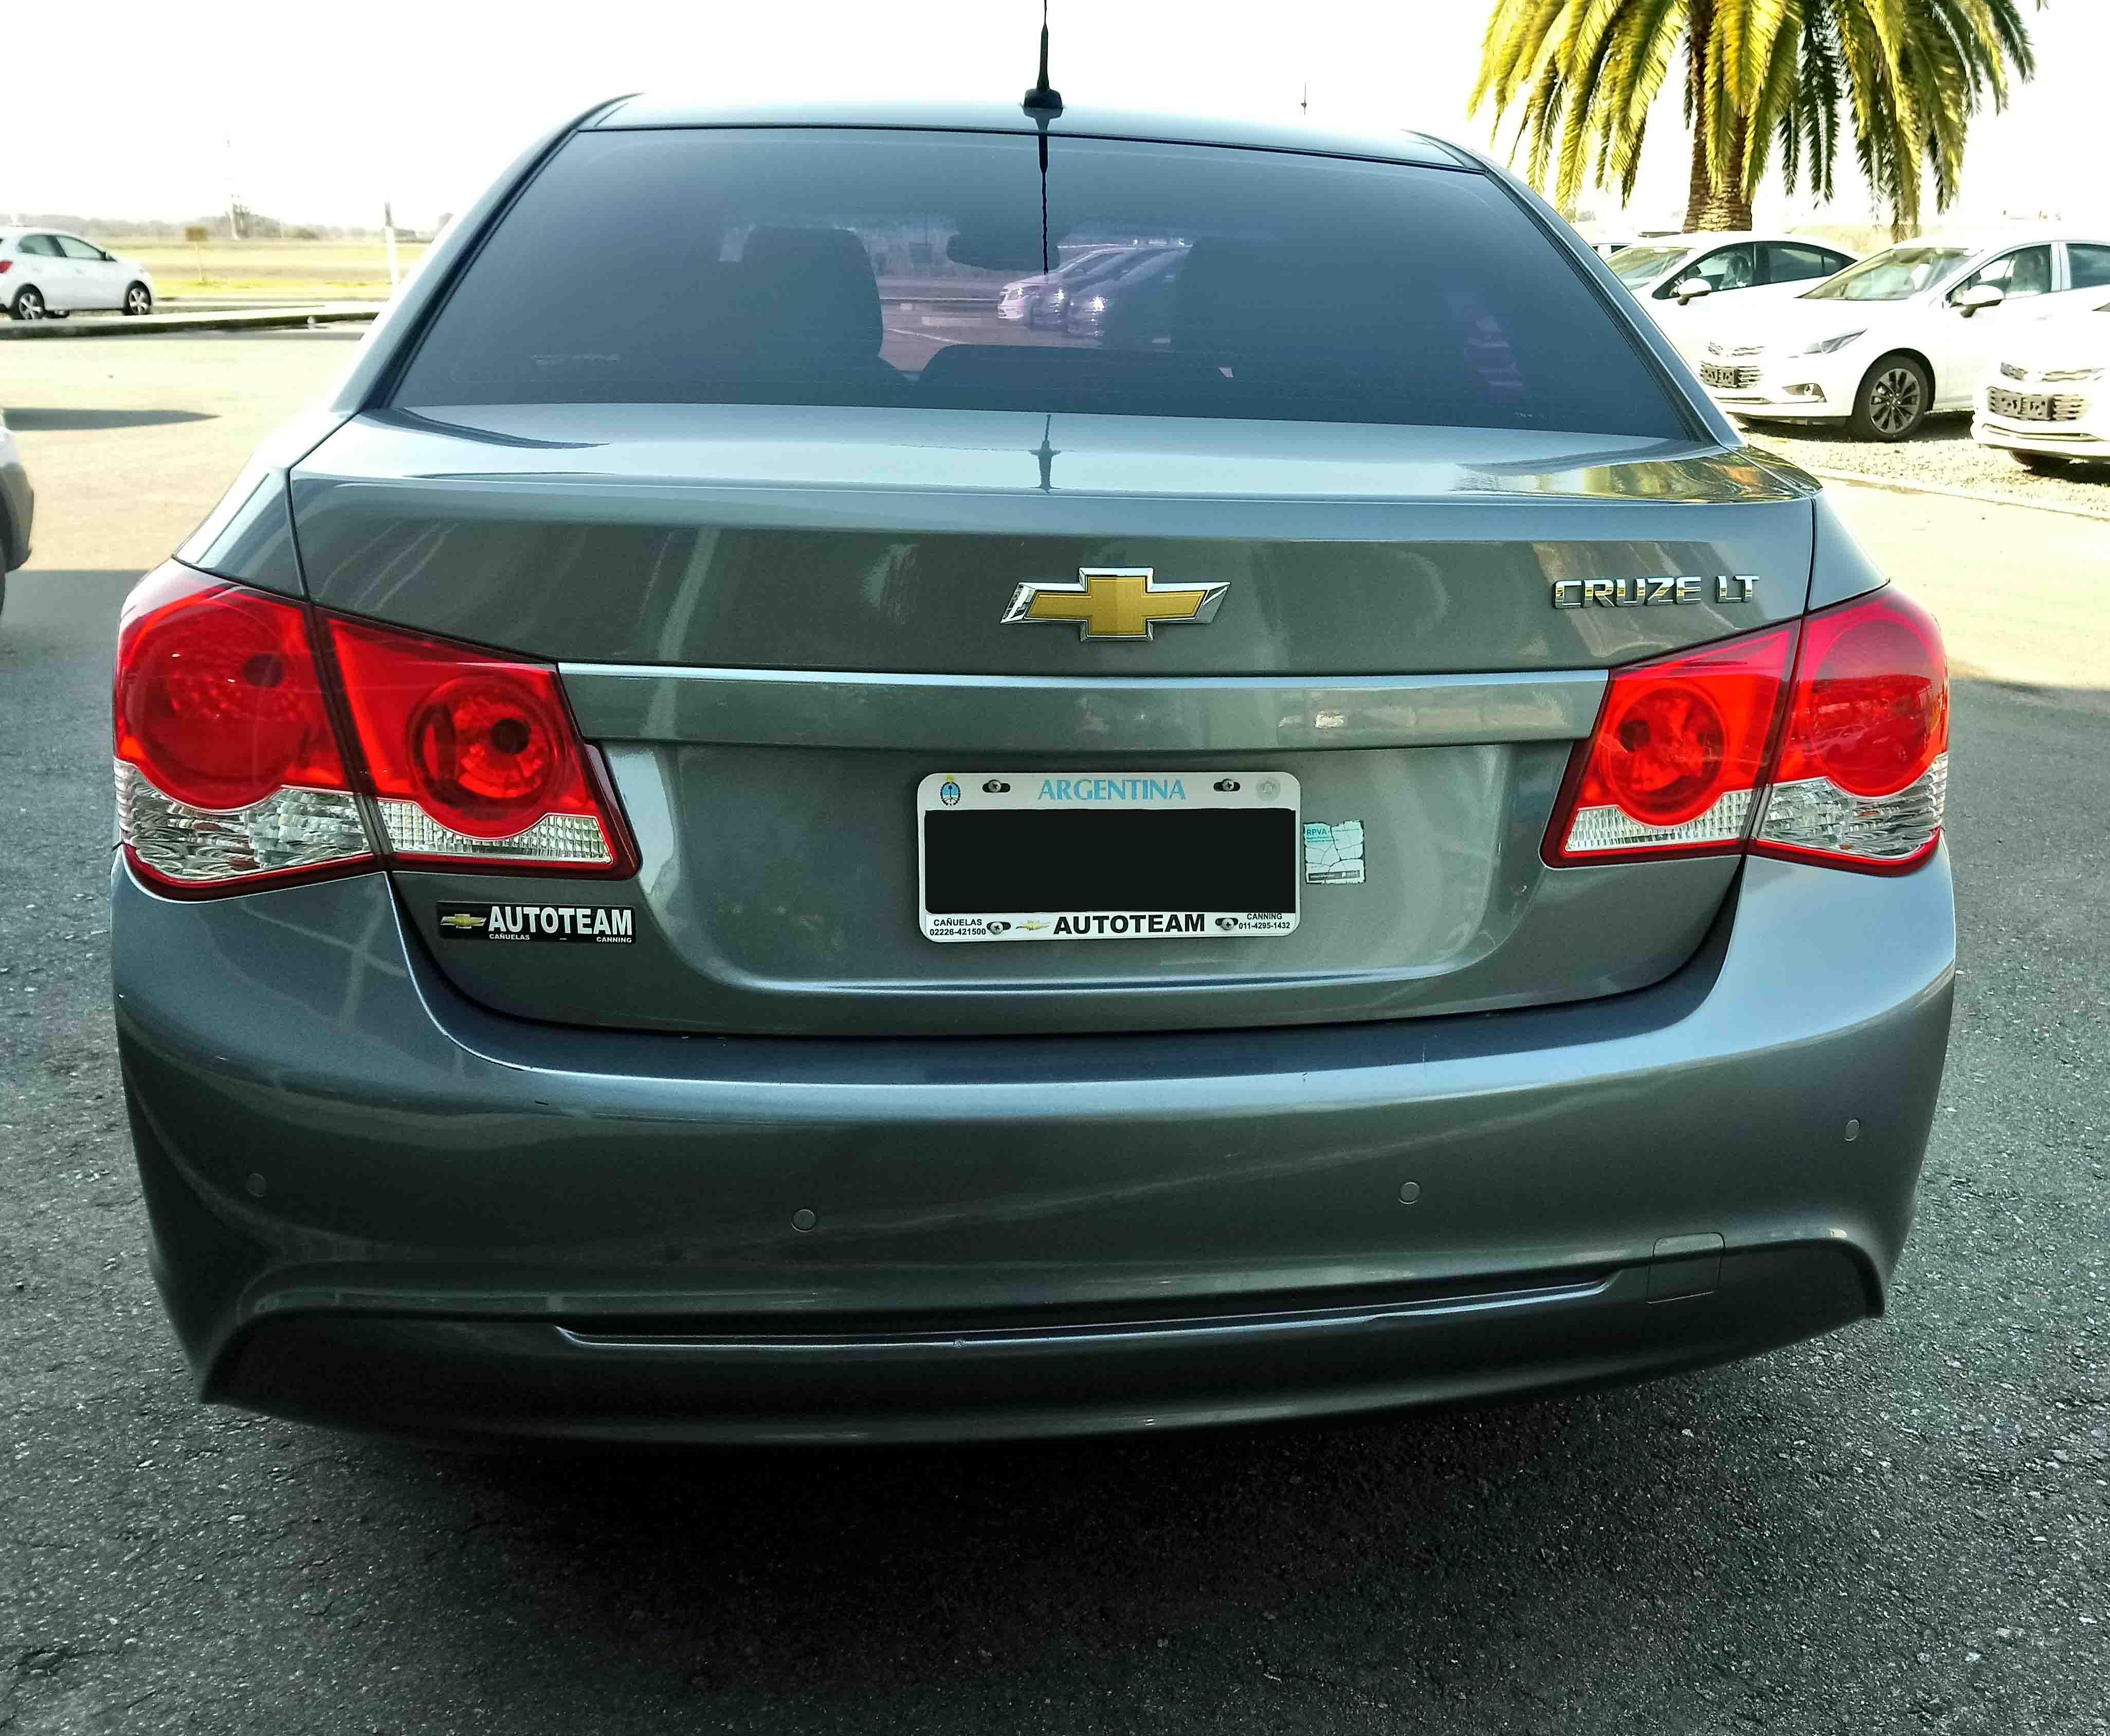 2015 Chevrolet Cruze LT 1.8L